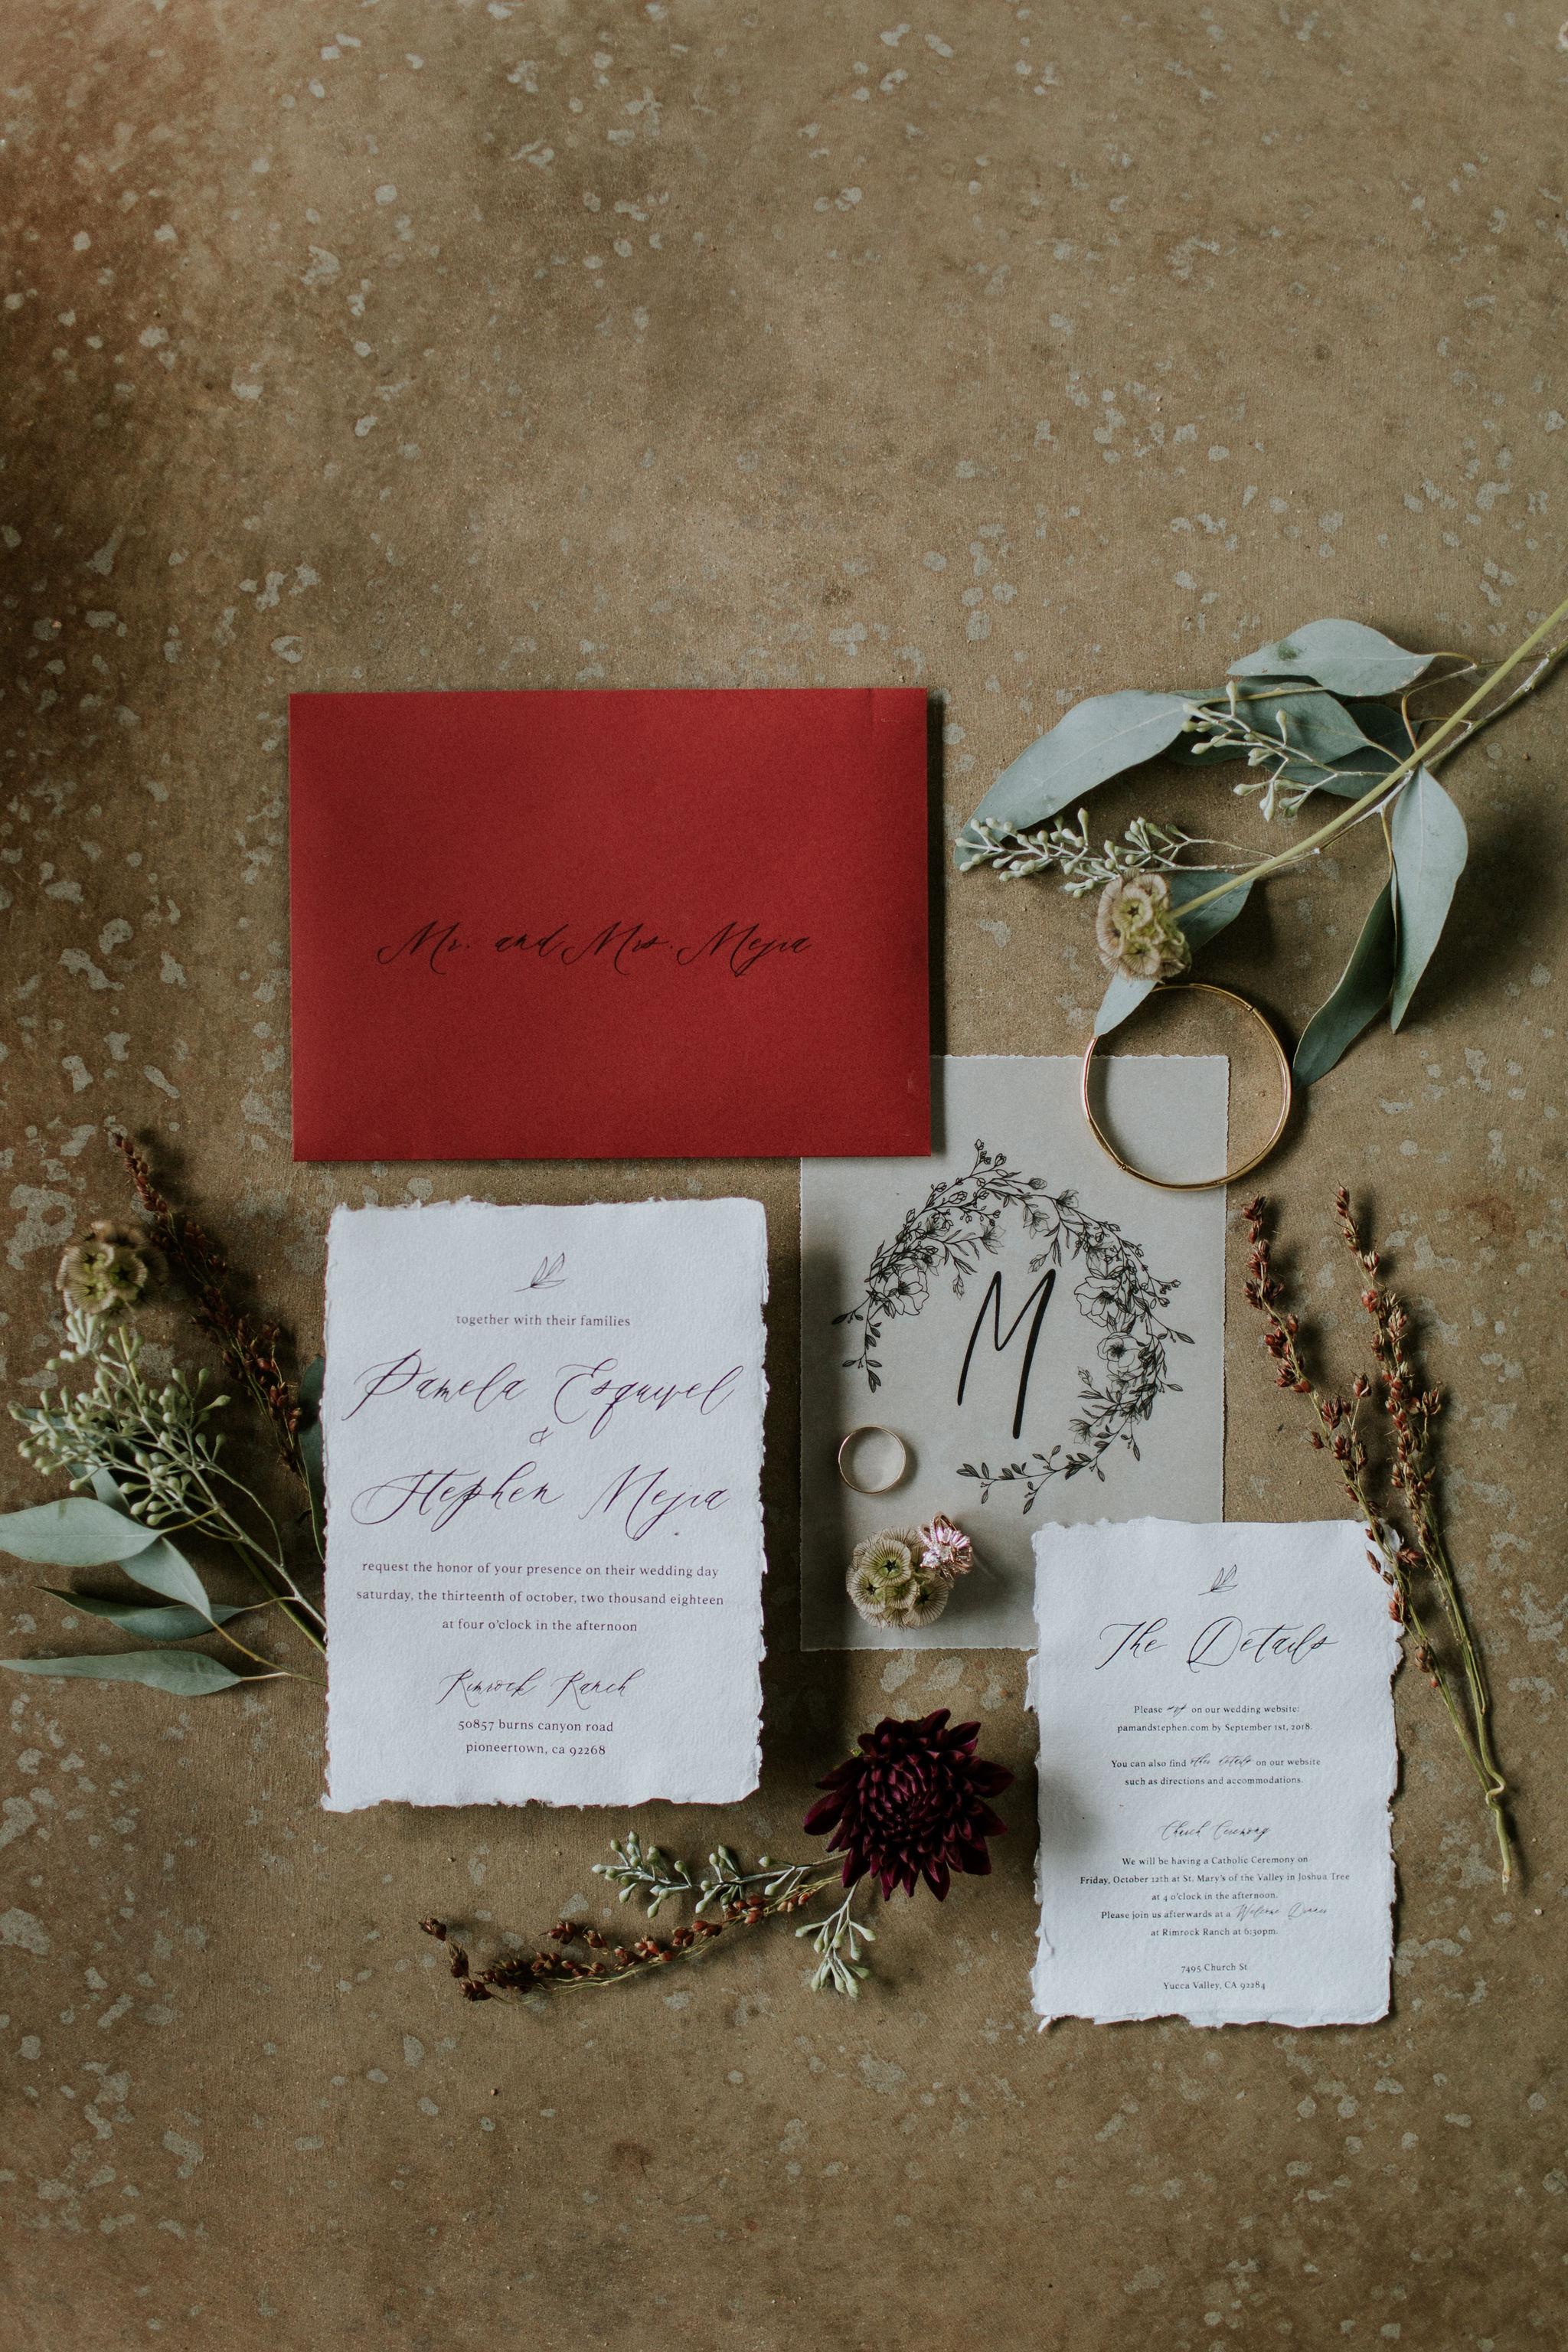 RimrockRanch-JoshuaTree-Wedding-Jami-Laree-3.jpg